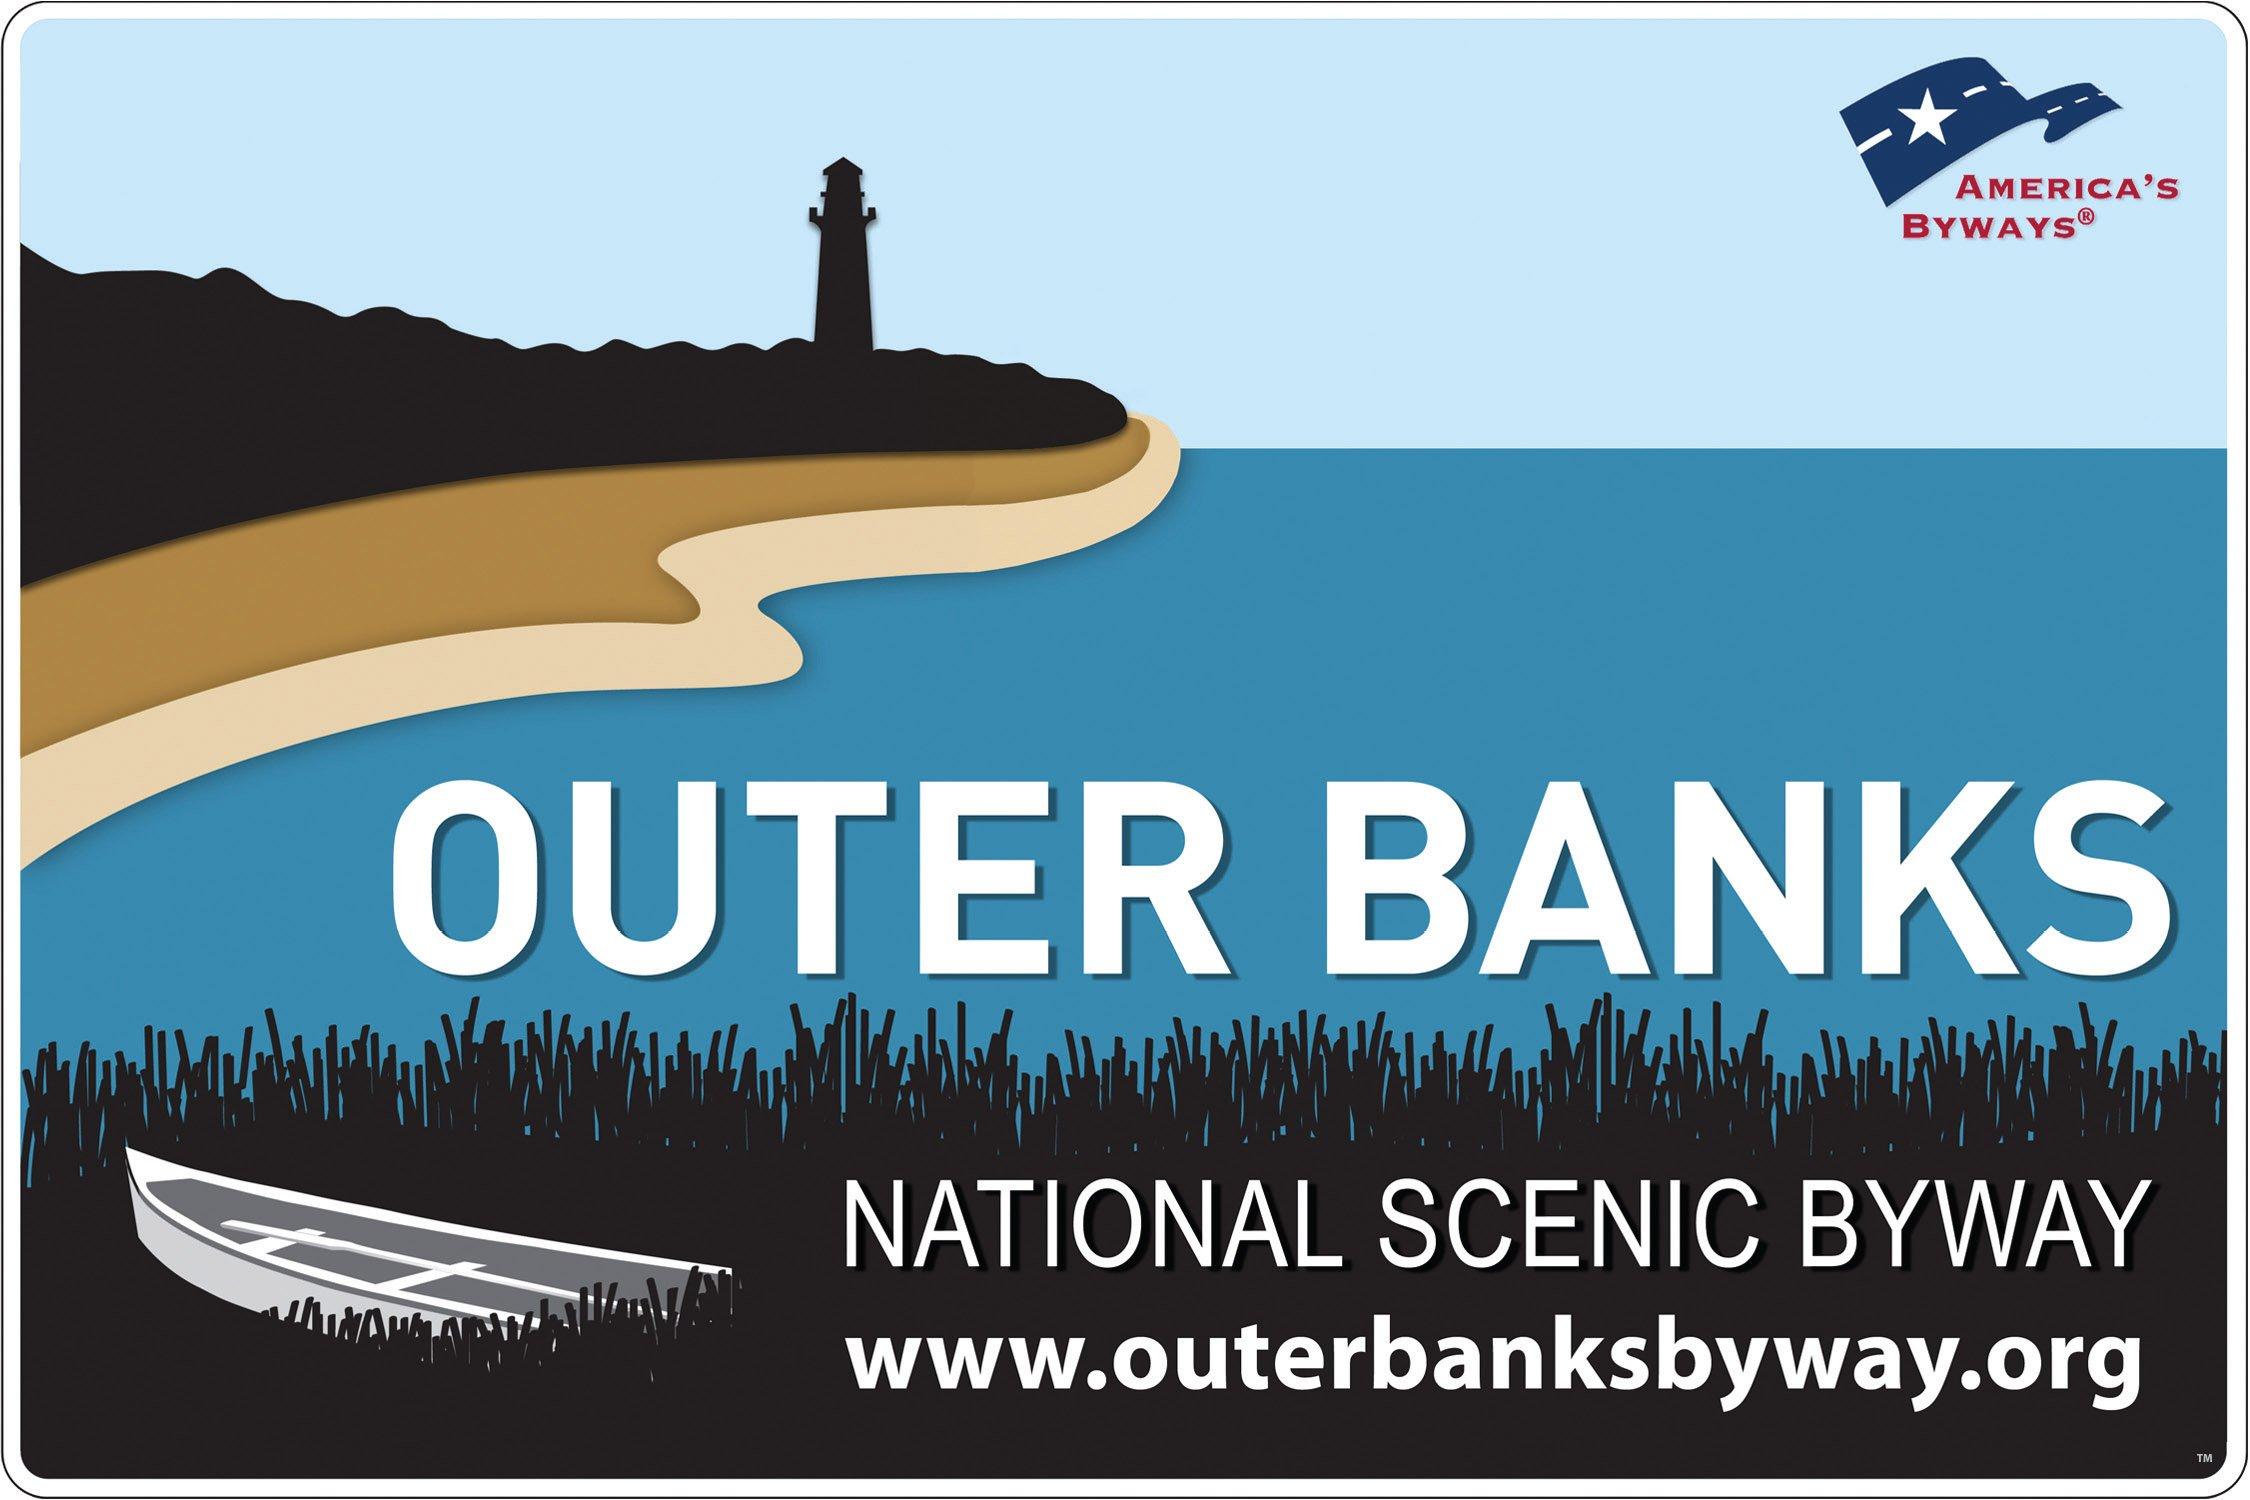 OBNSB_BumperSticker_05-08-2013_TM